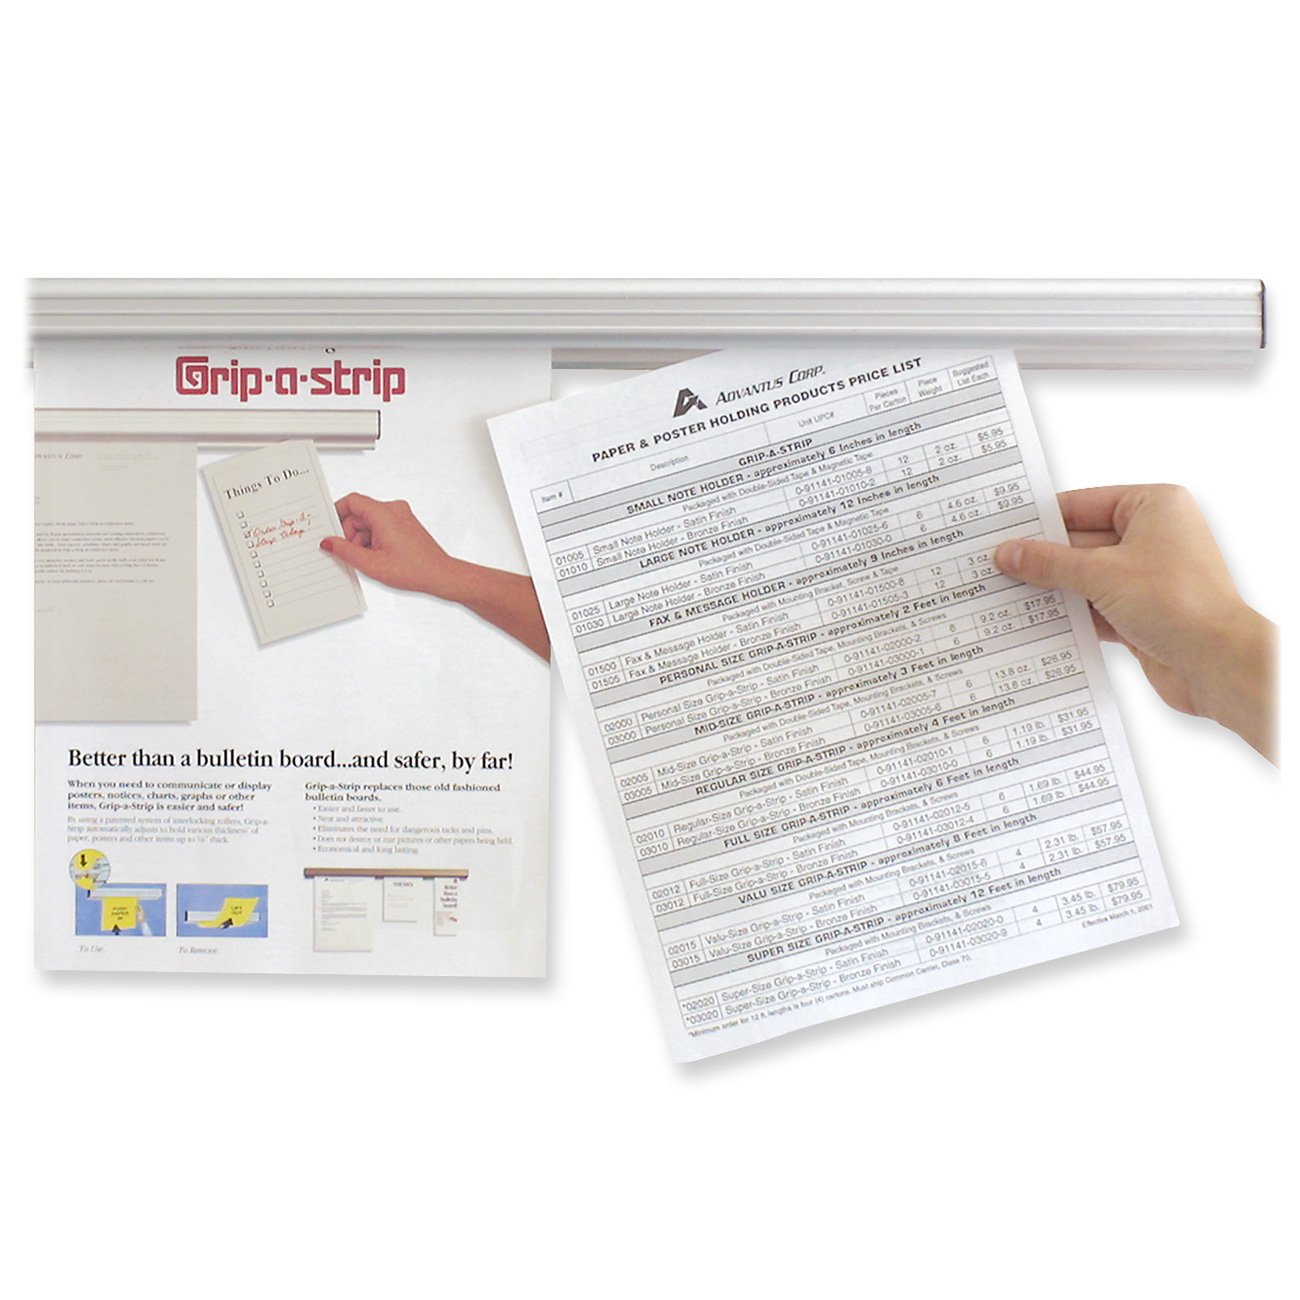 Amazon.com : ADVANTUS Grip-A-Strip Display Rail, Value Size, 8 ...